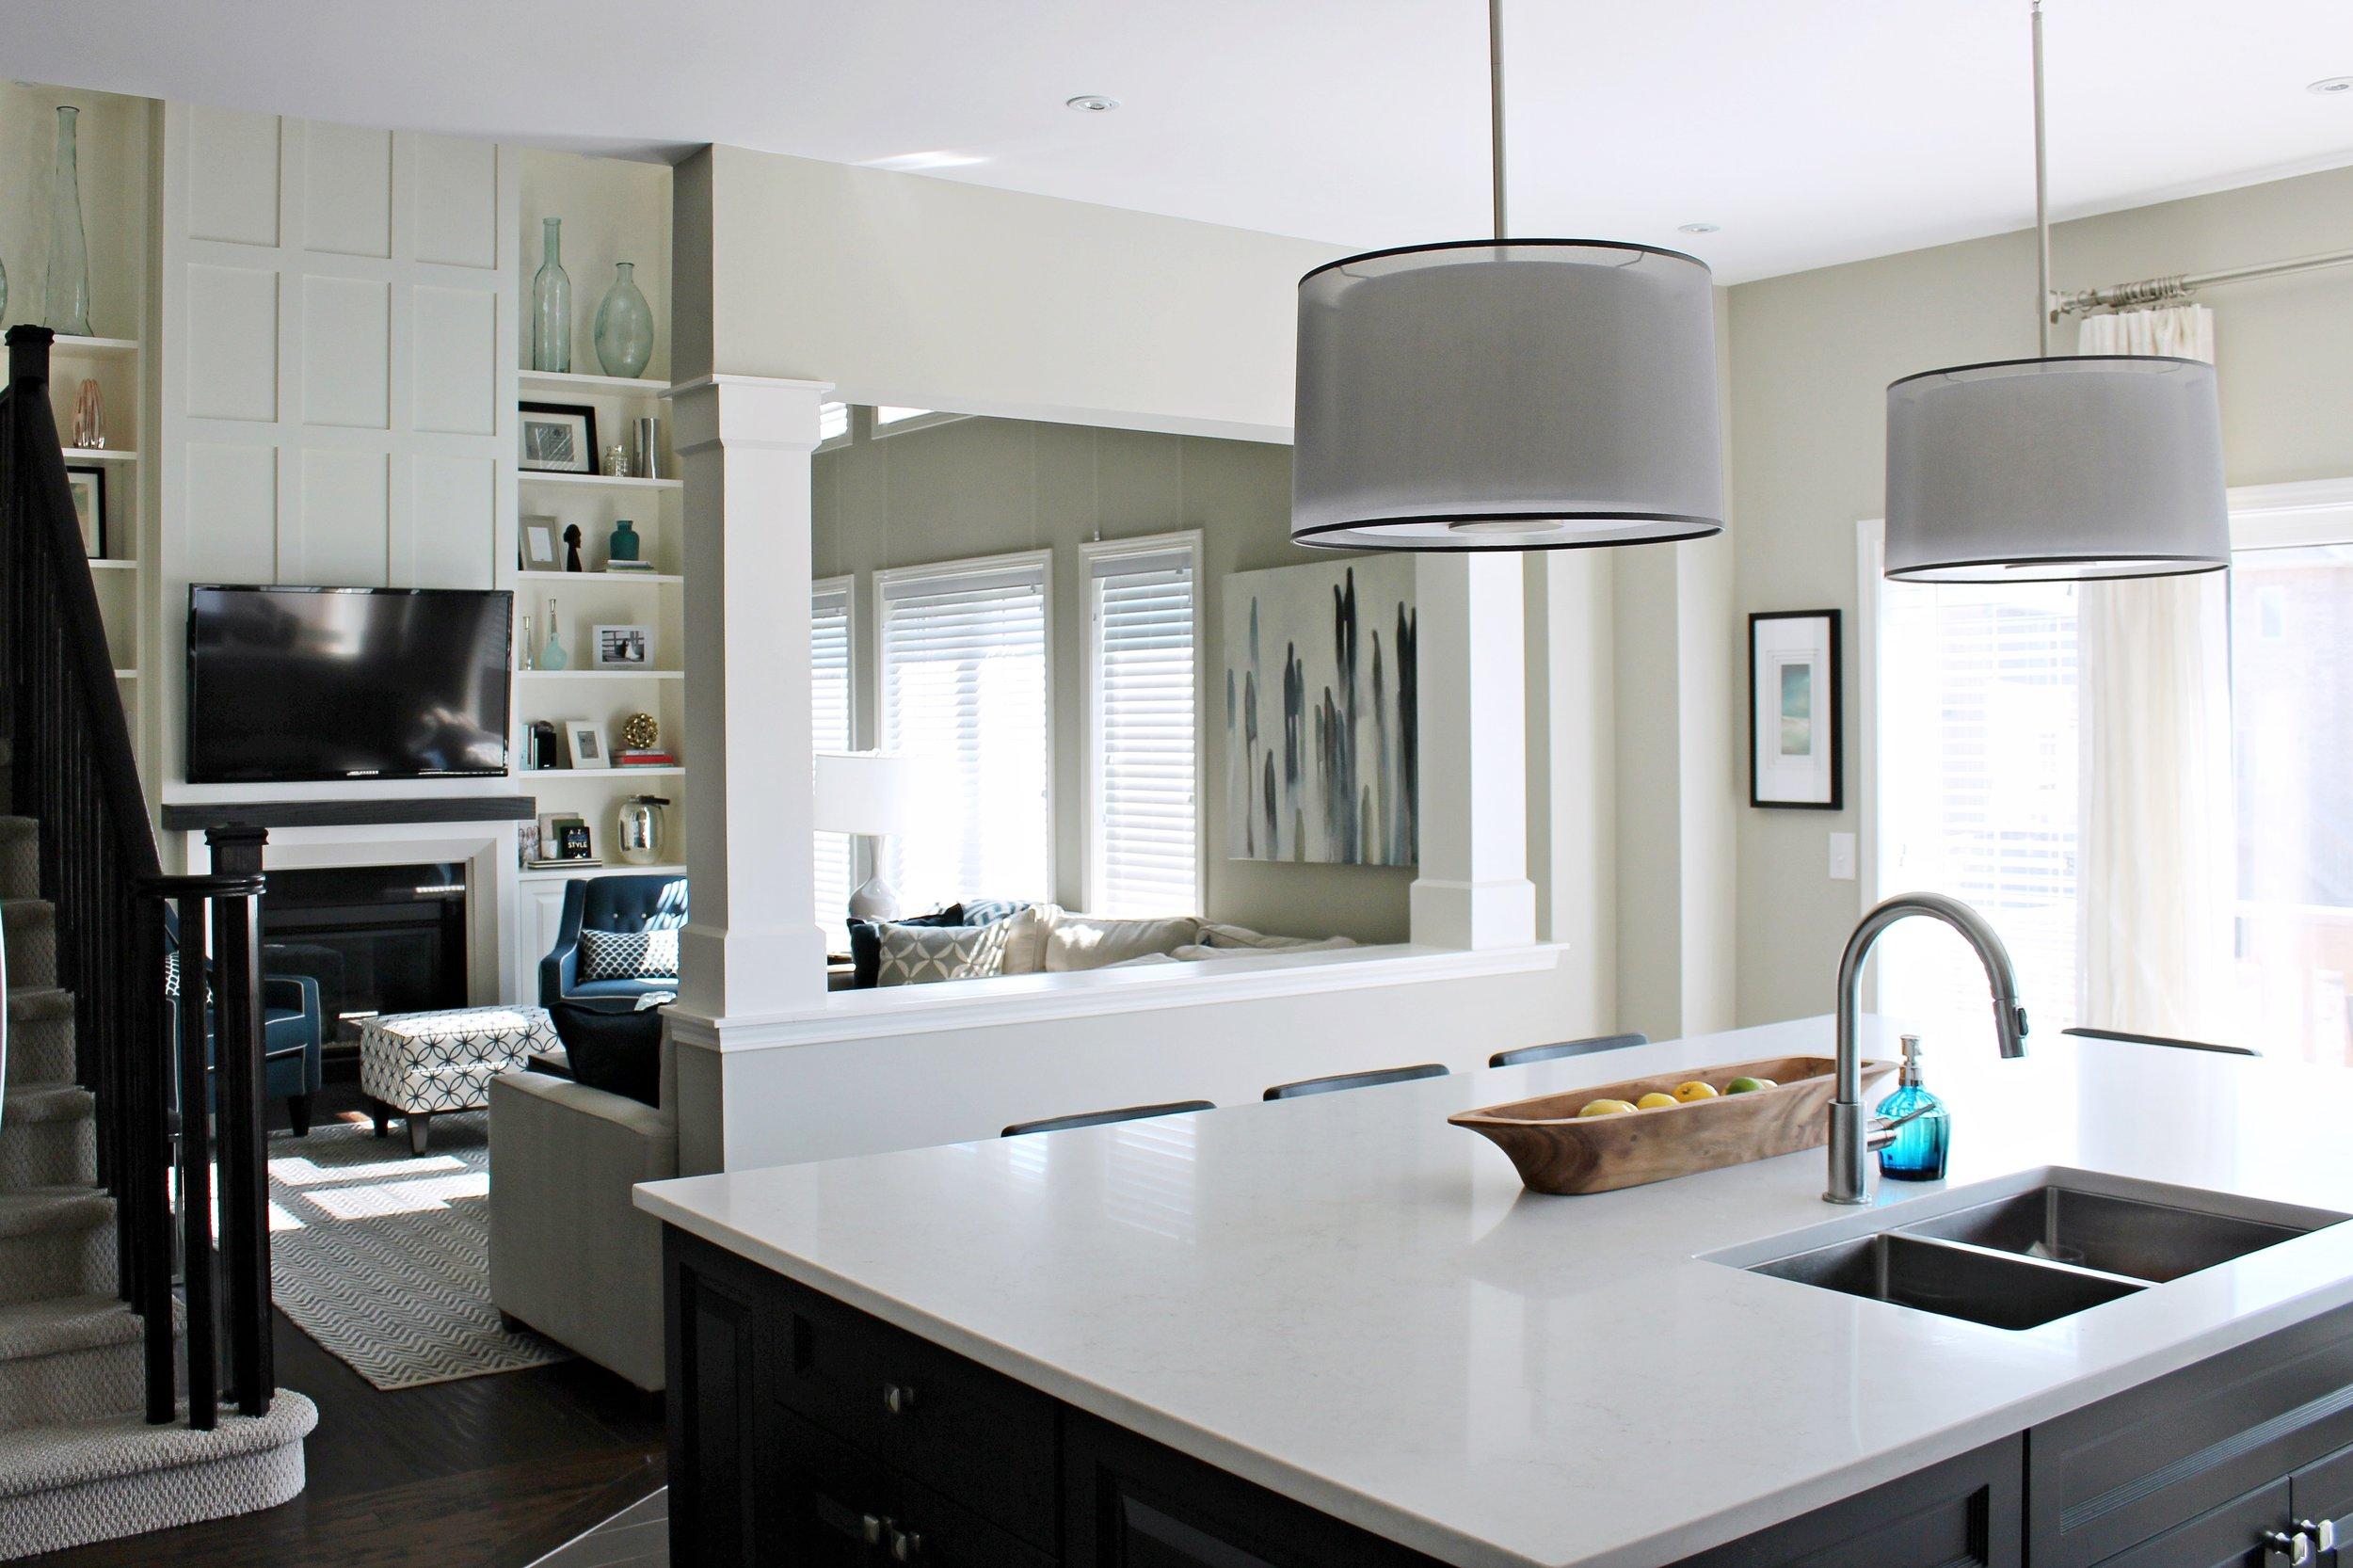 Alton Village Residence — KMSalter Design